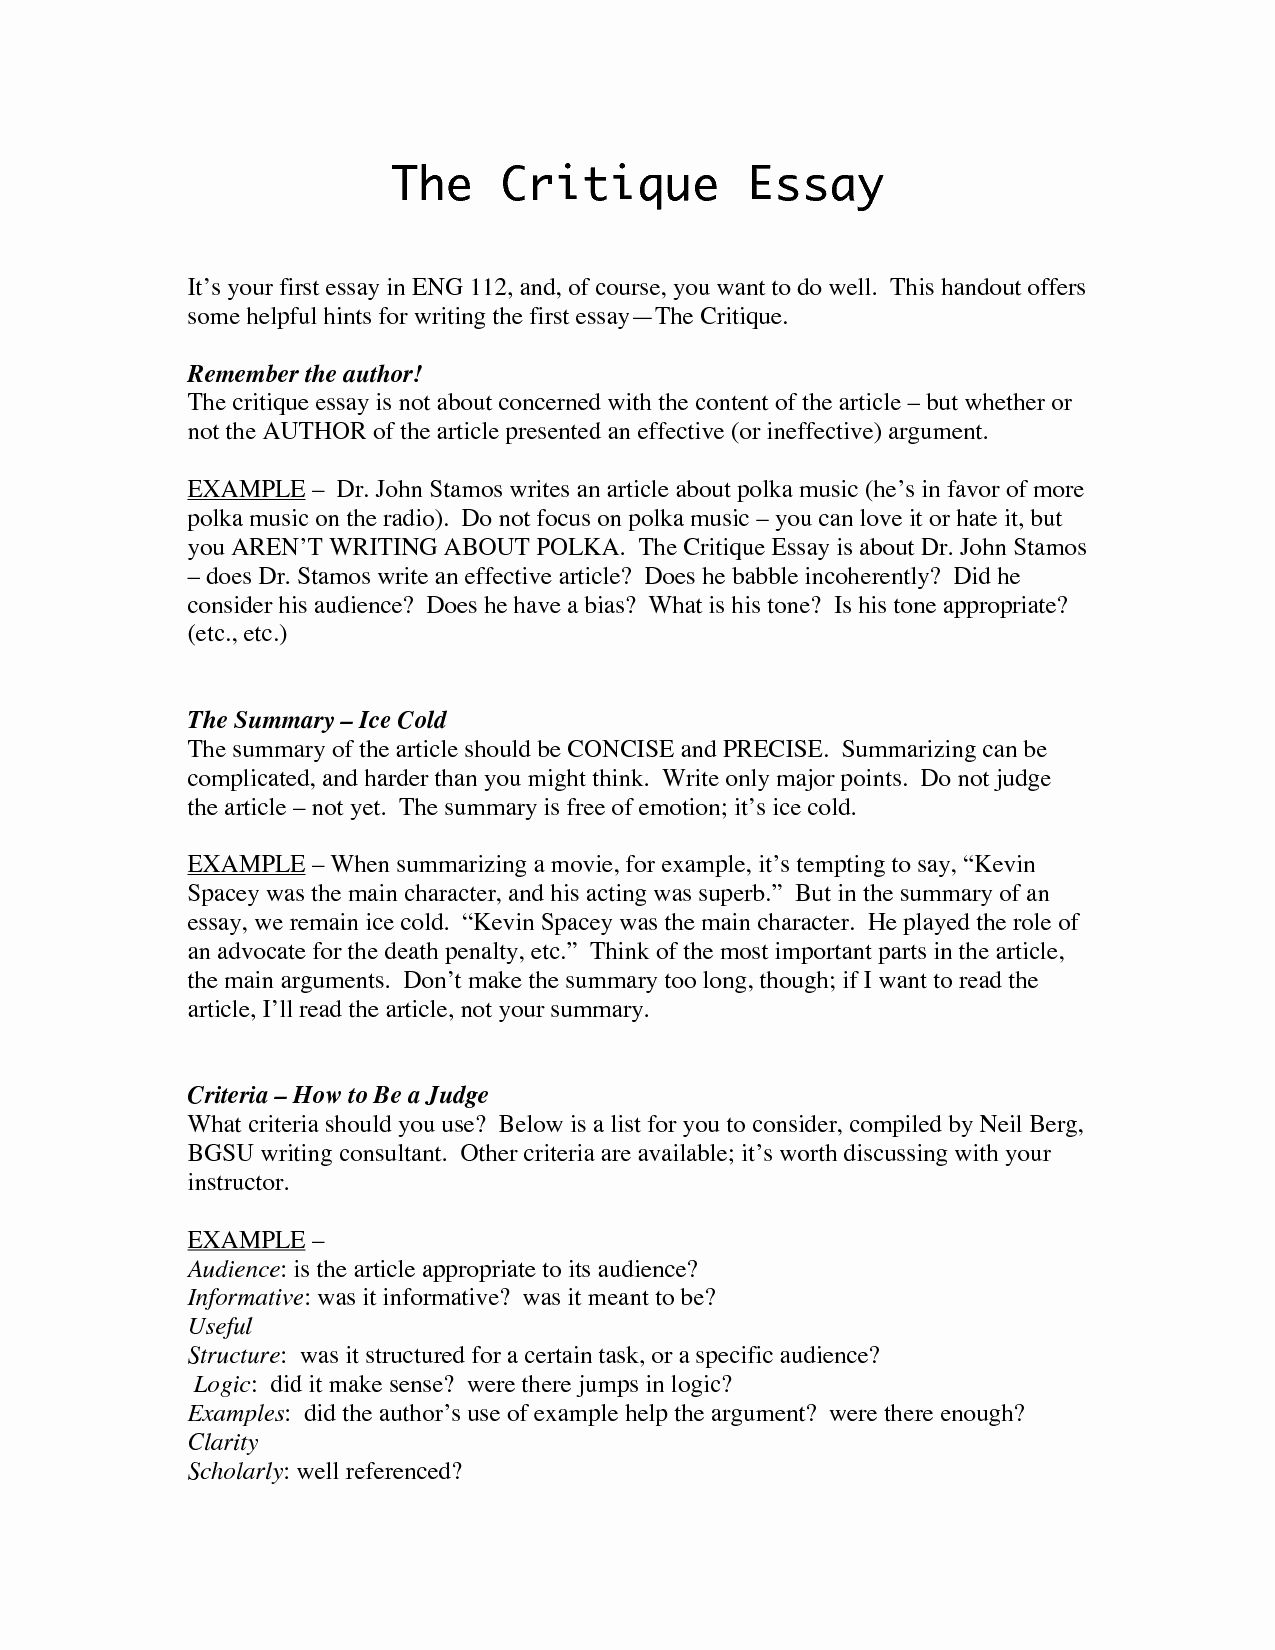 Essay checker free